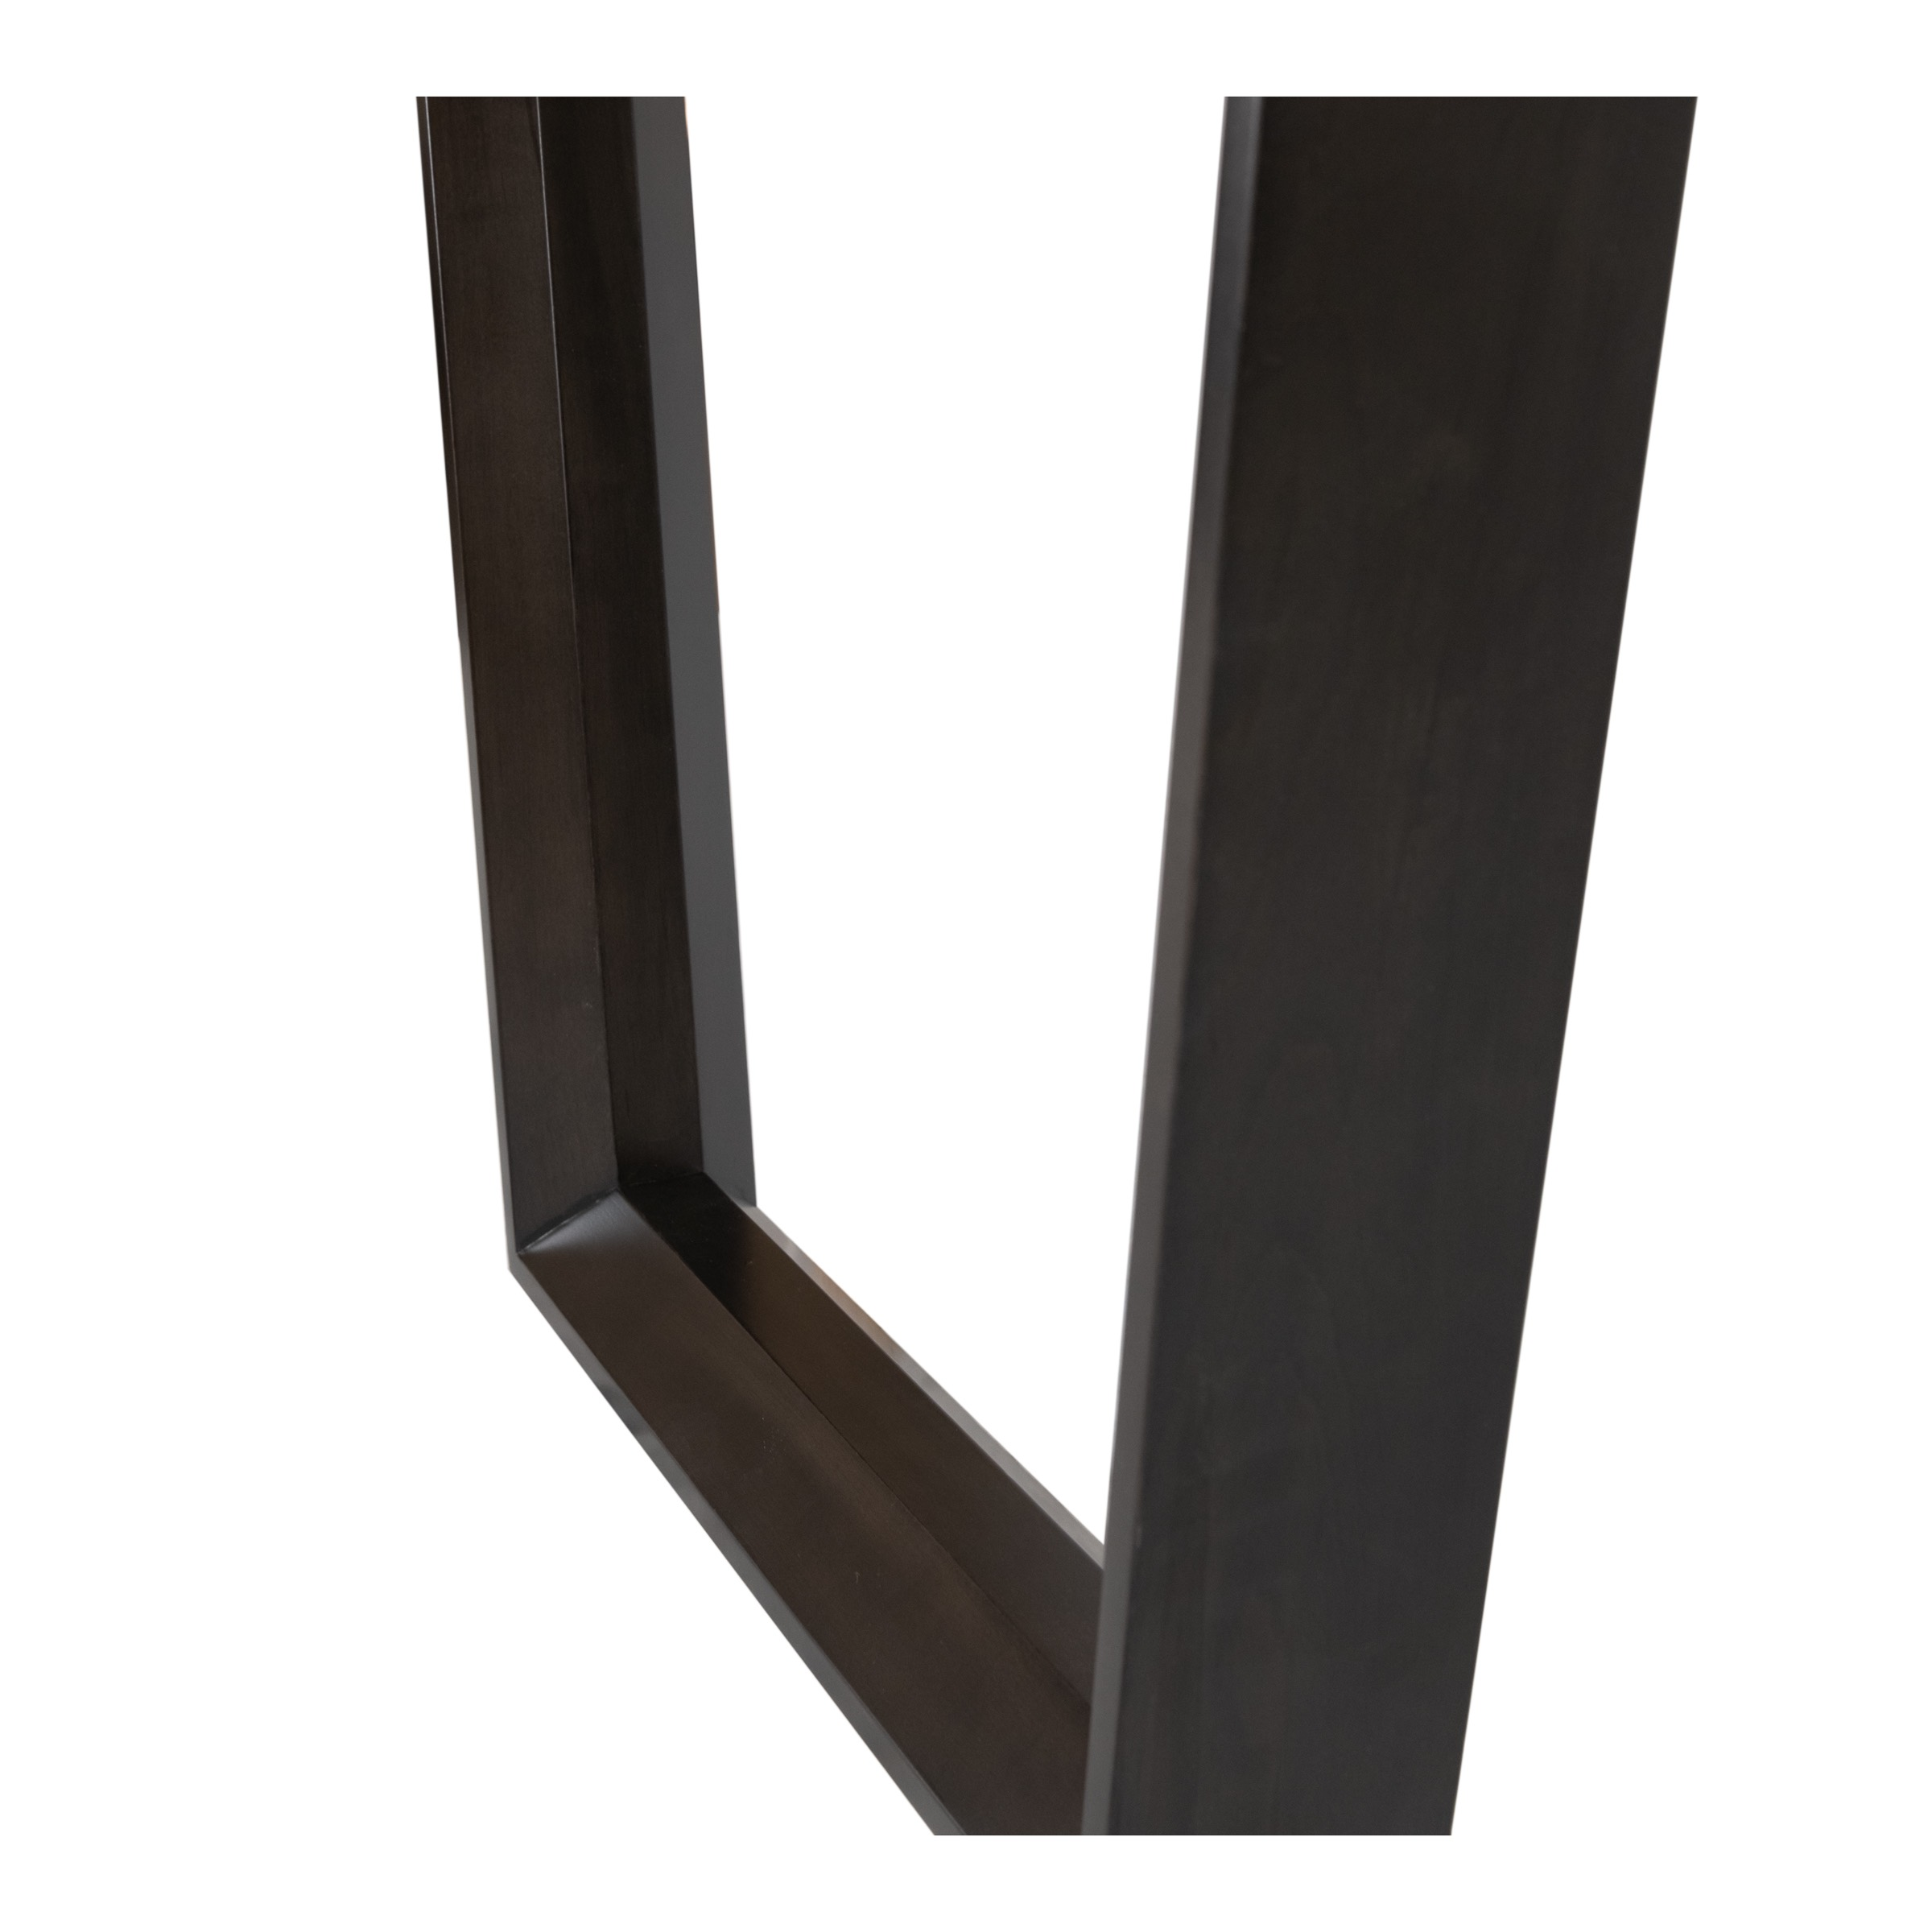 Woodcraft_Furniture_Kubric_Dining_Table_Dark_005_February-15-2019-1.jpeg